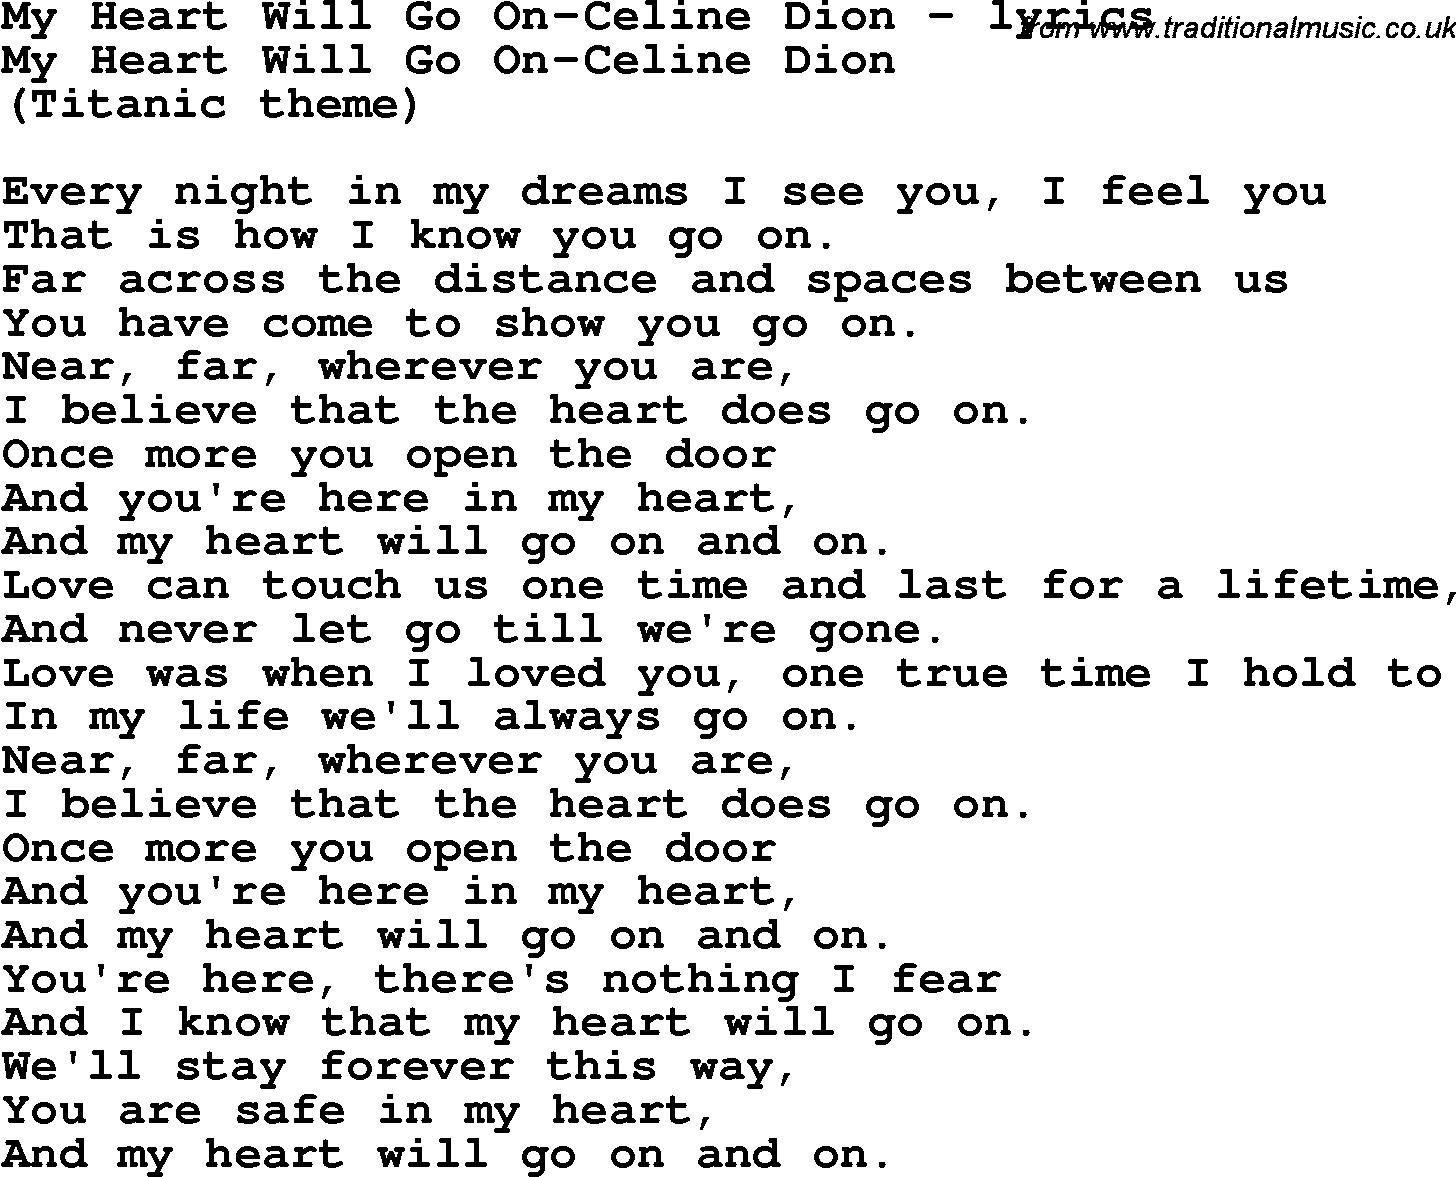 Download Celine Dion My Heart Will Go On Lyrics - DownloadMeta